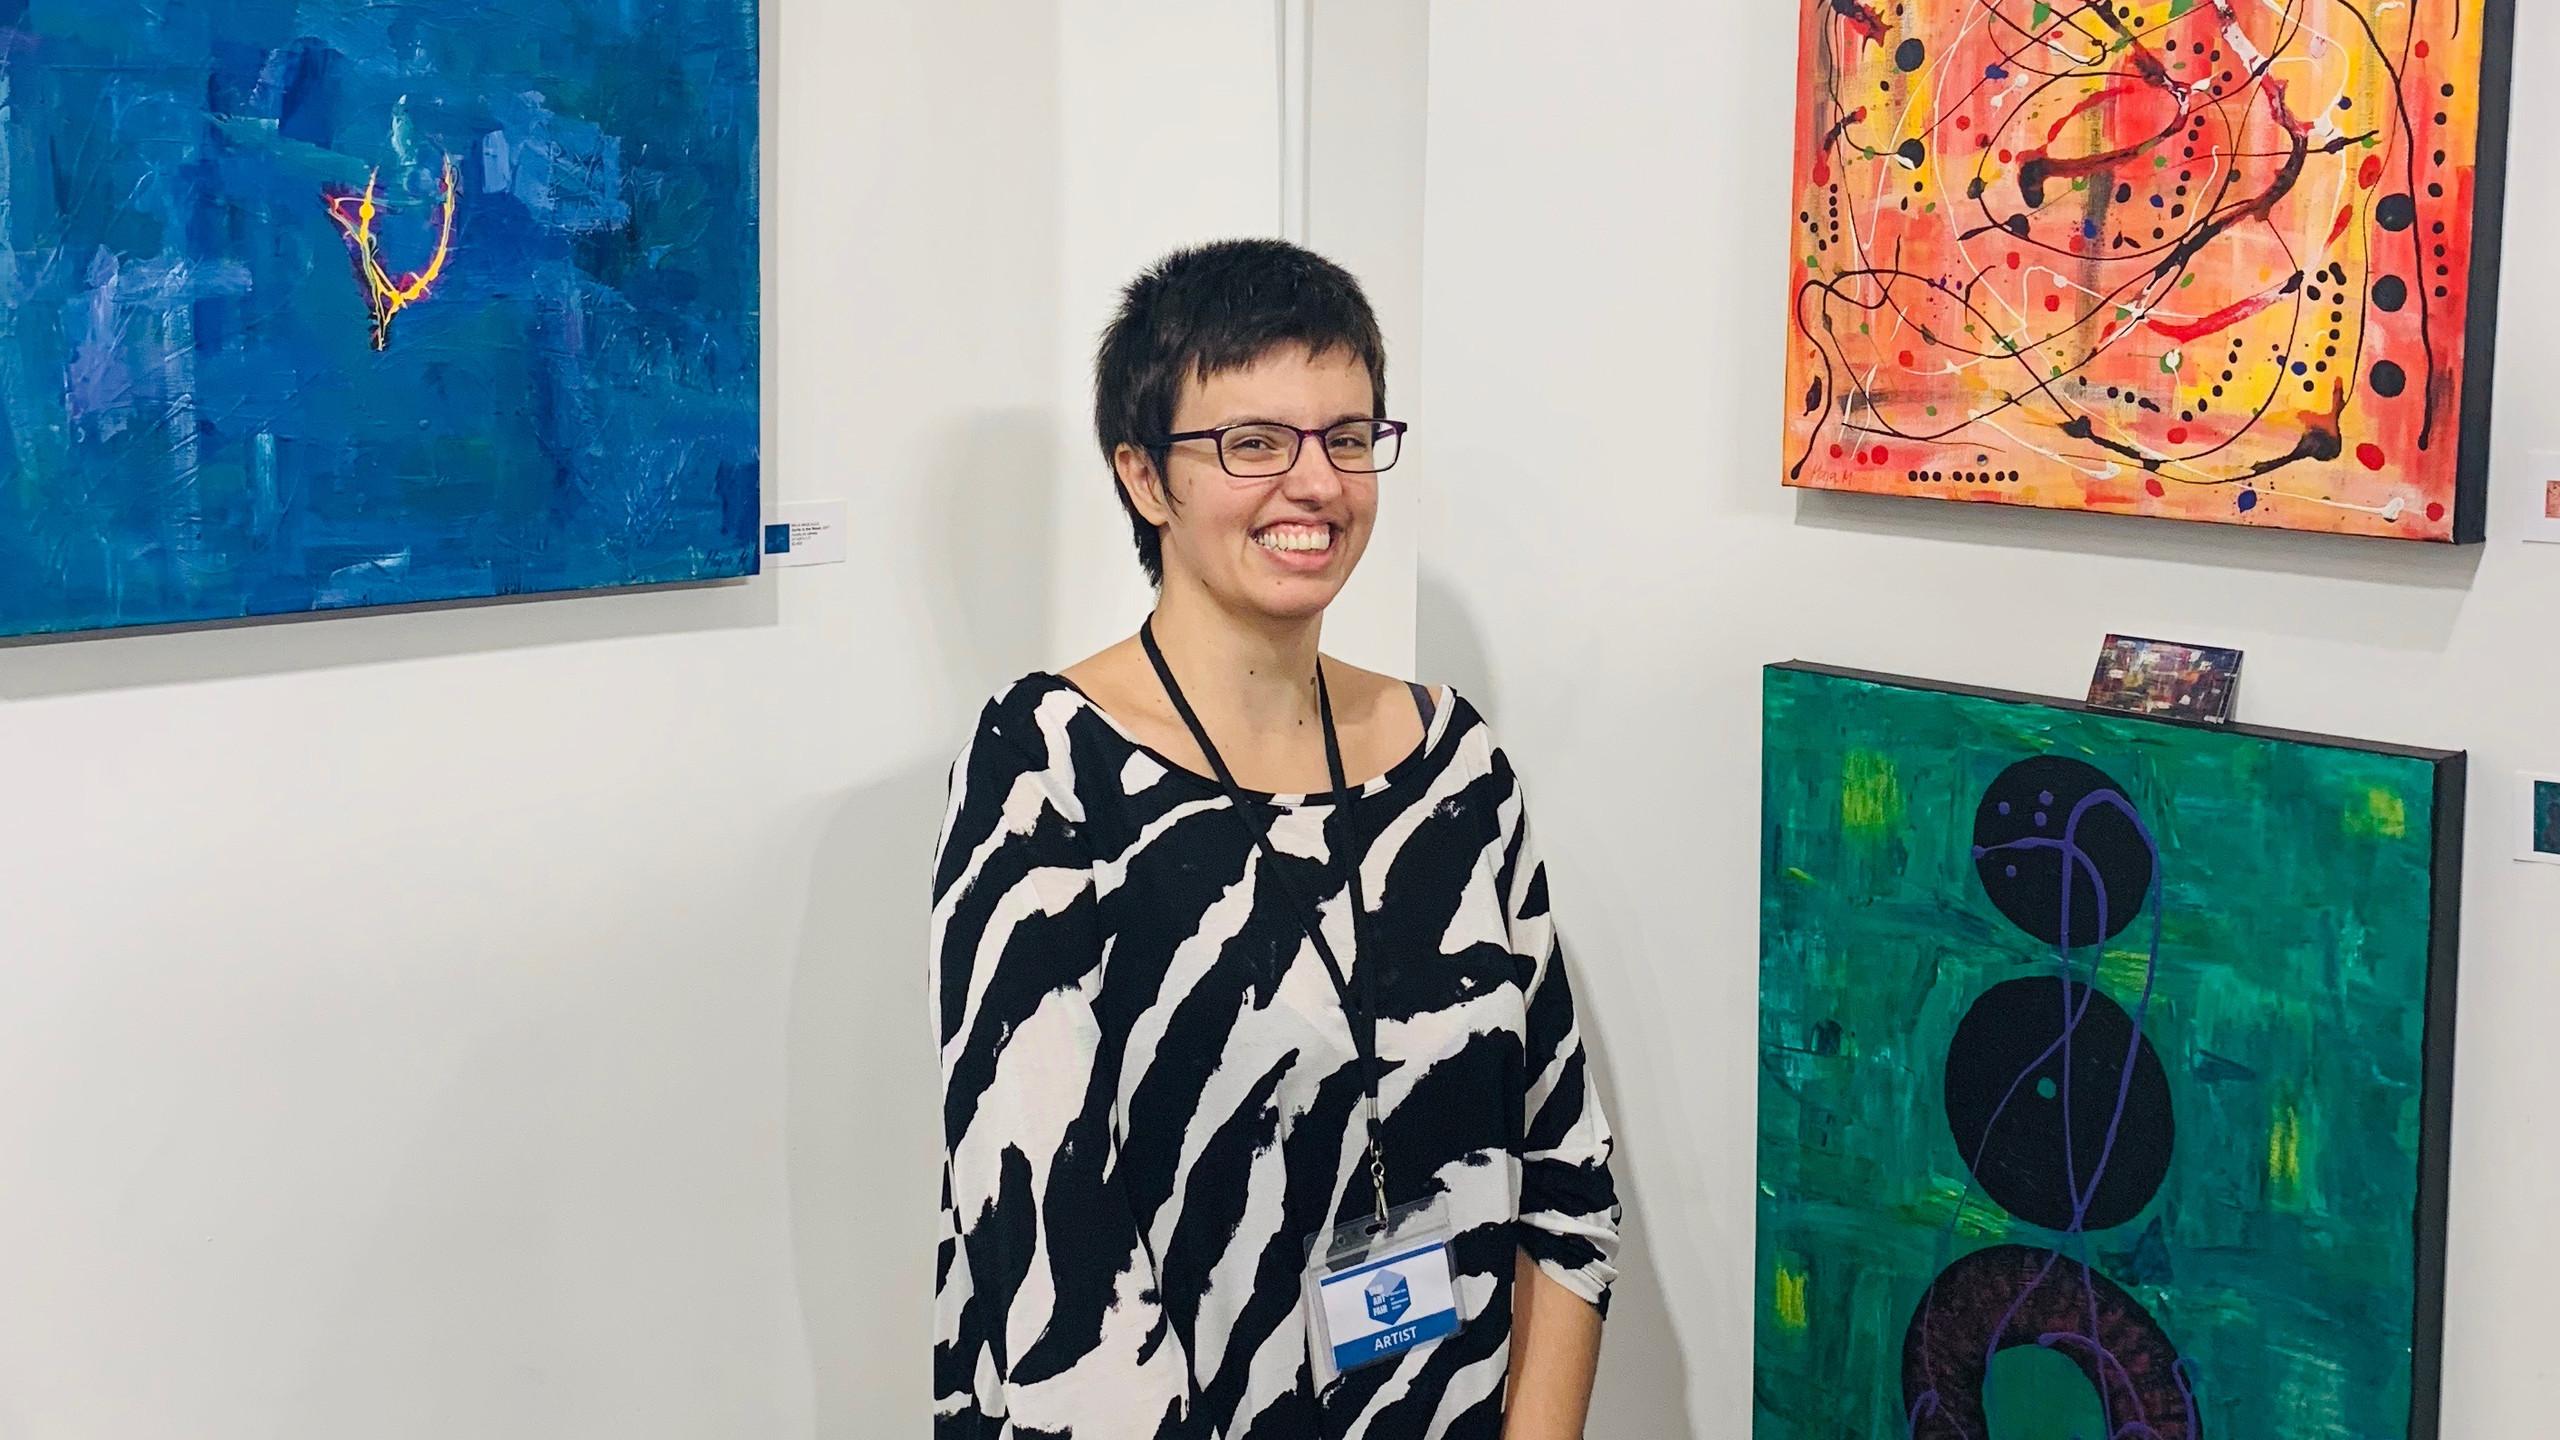 Artist Maja Maglajlic